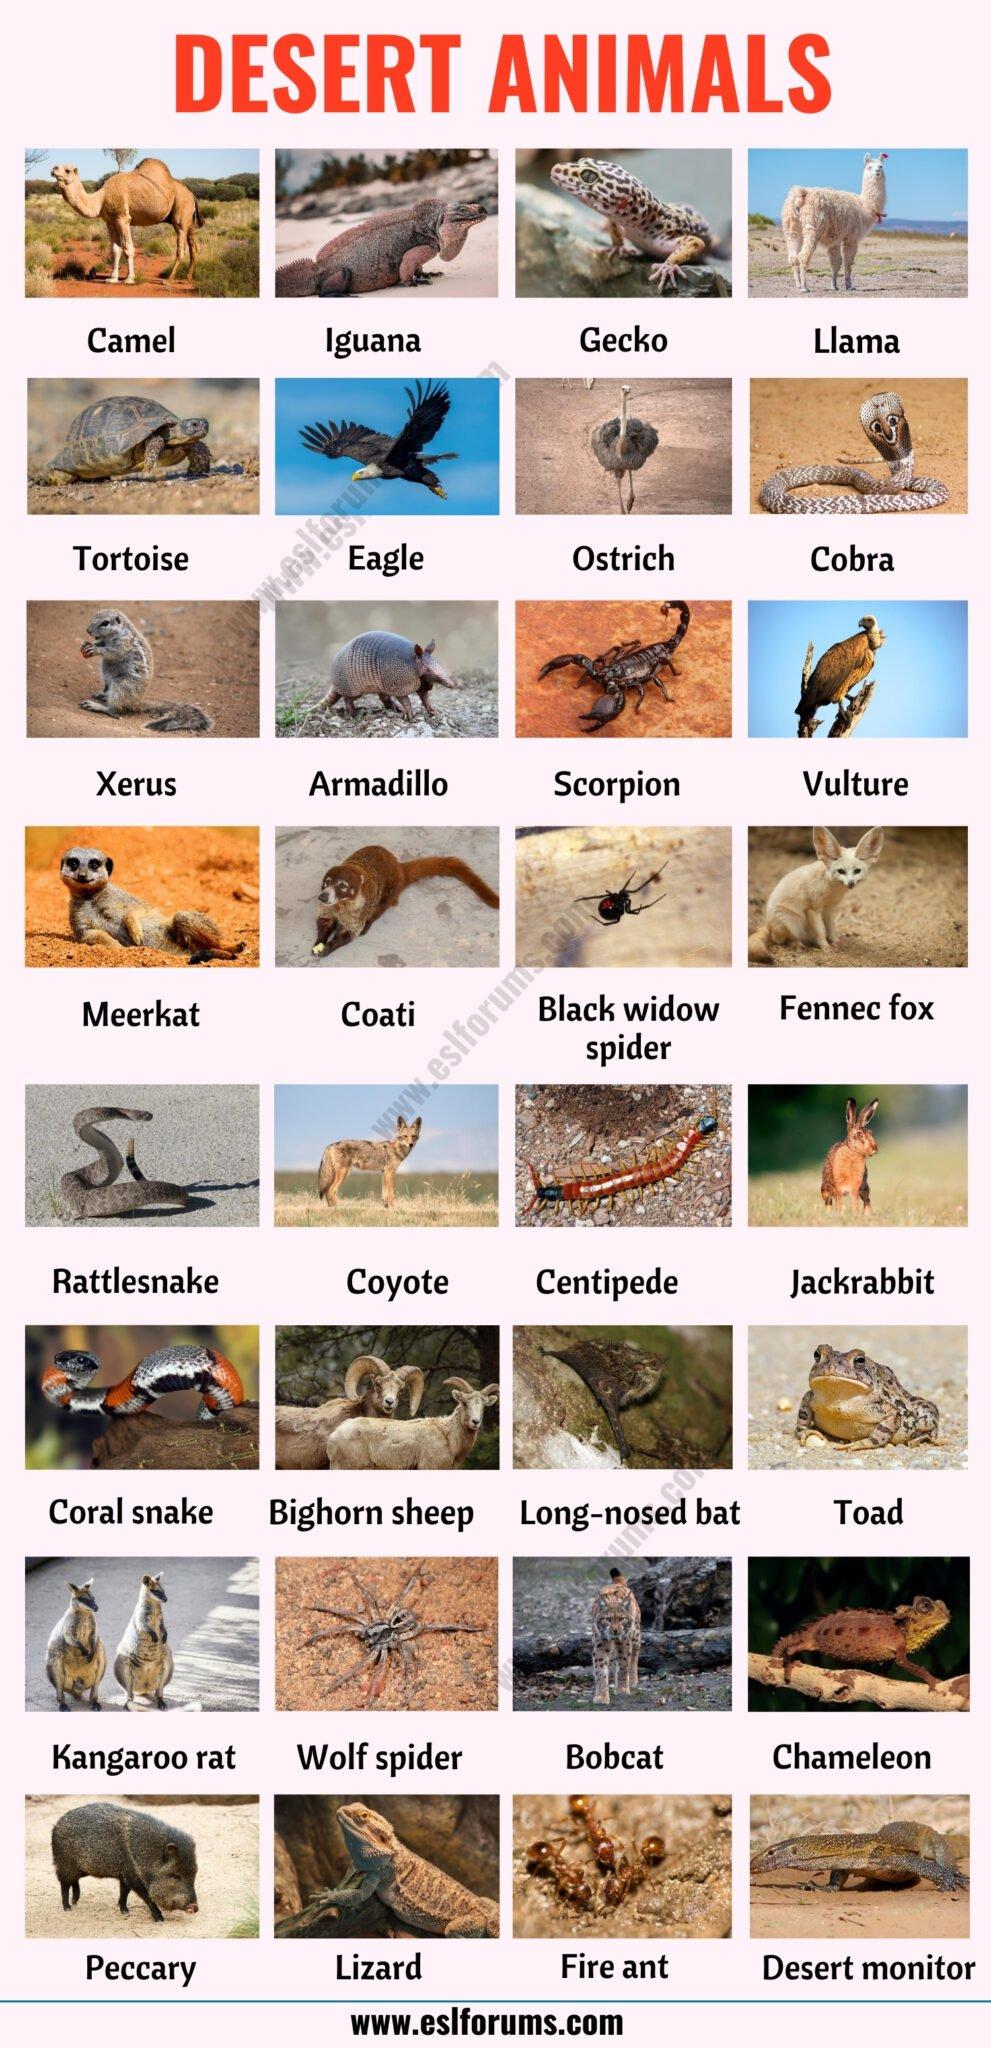 Desert Animals: List of 35+ Best Animals that Live in the Desert with ESL Picture